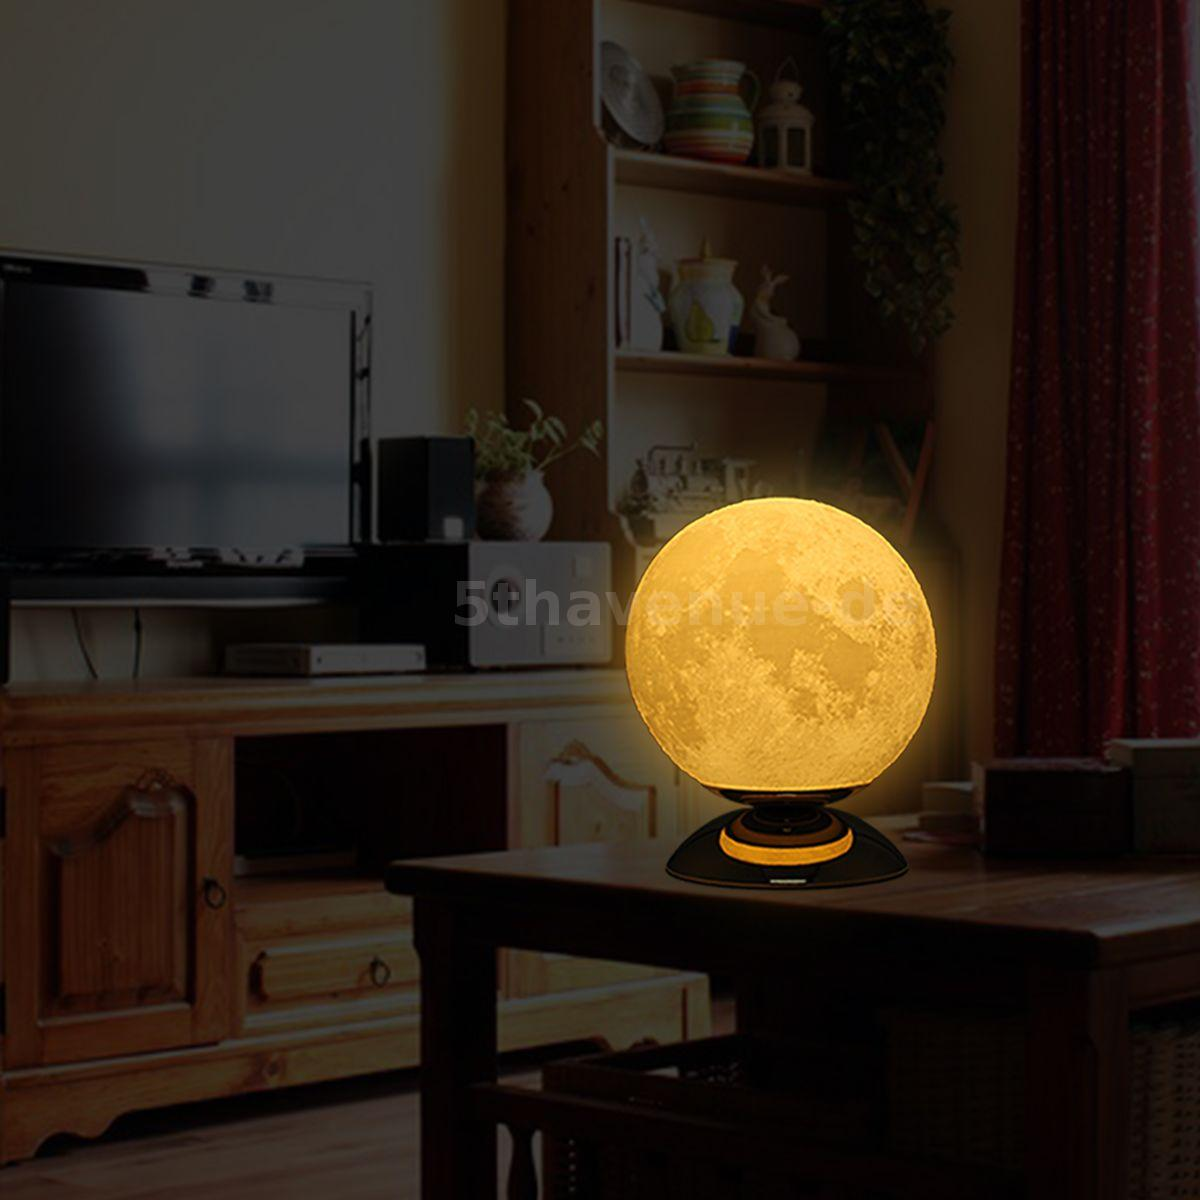 Tooarts Moon Lamp 3D-Druck-Lampe Moderne Skulptur Hauptdekoration ...